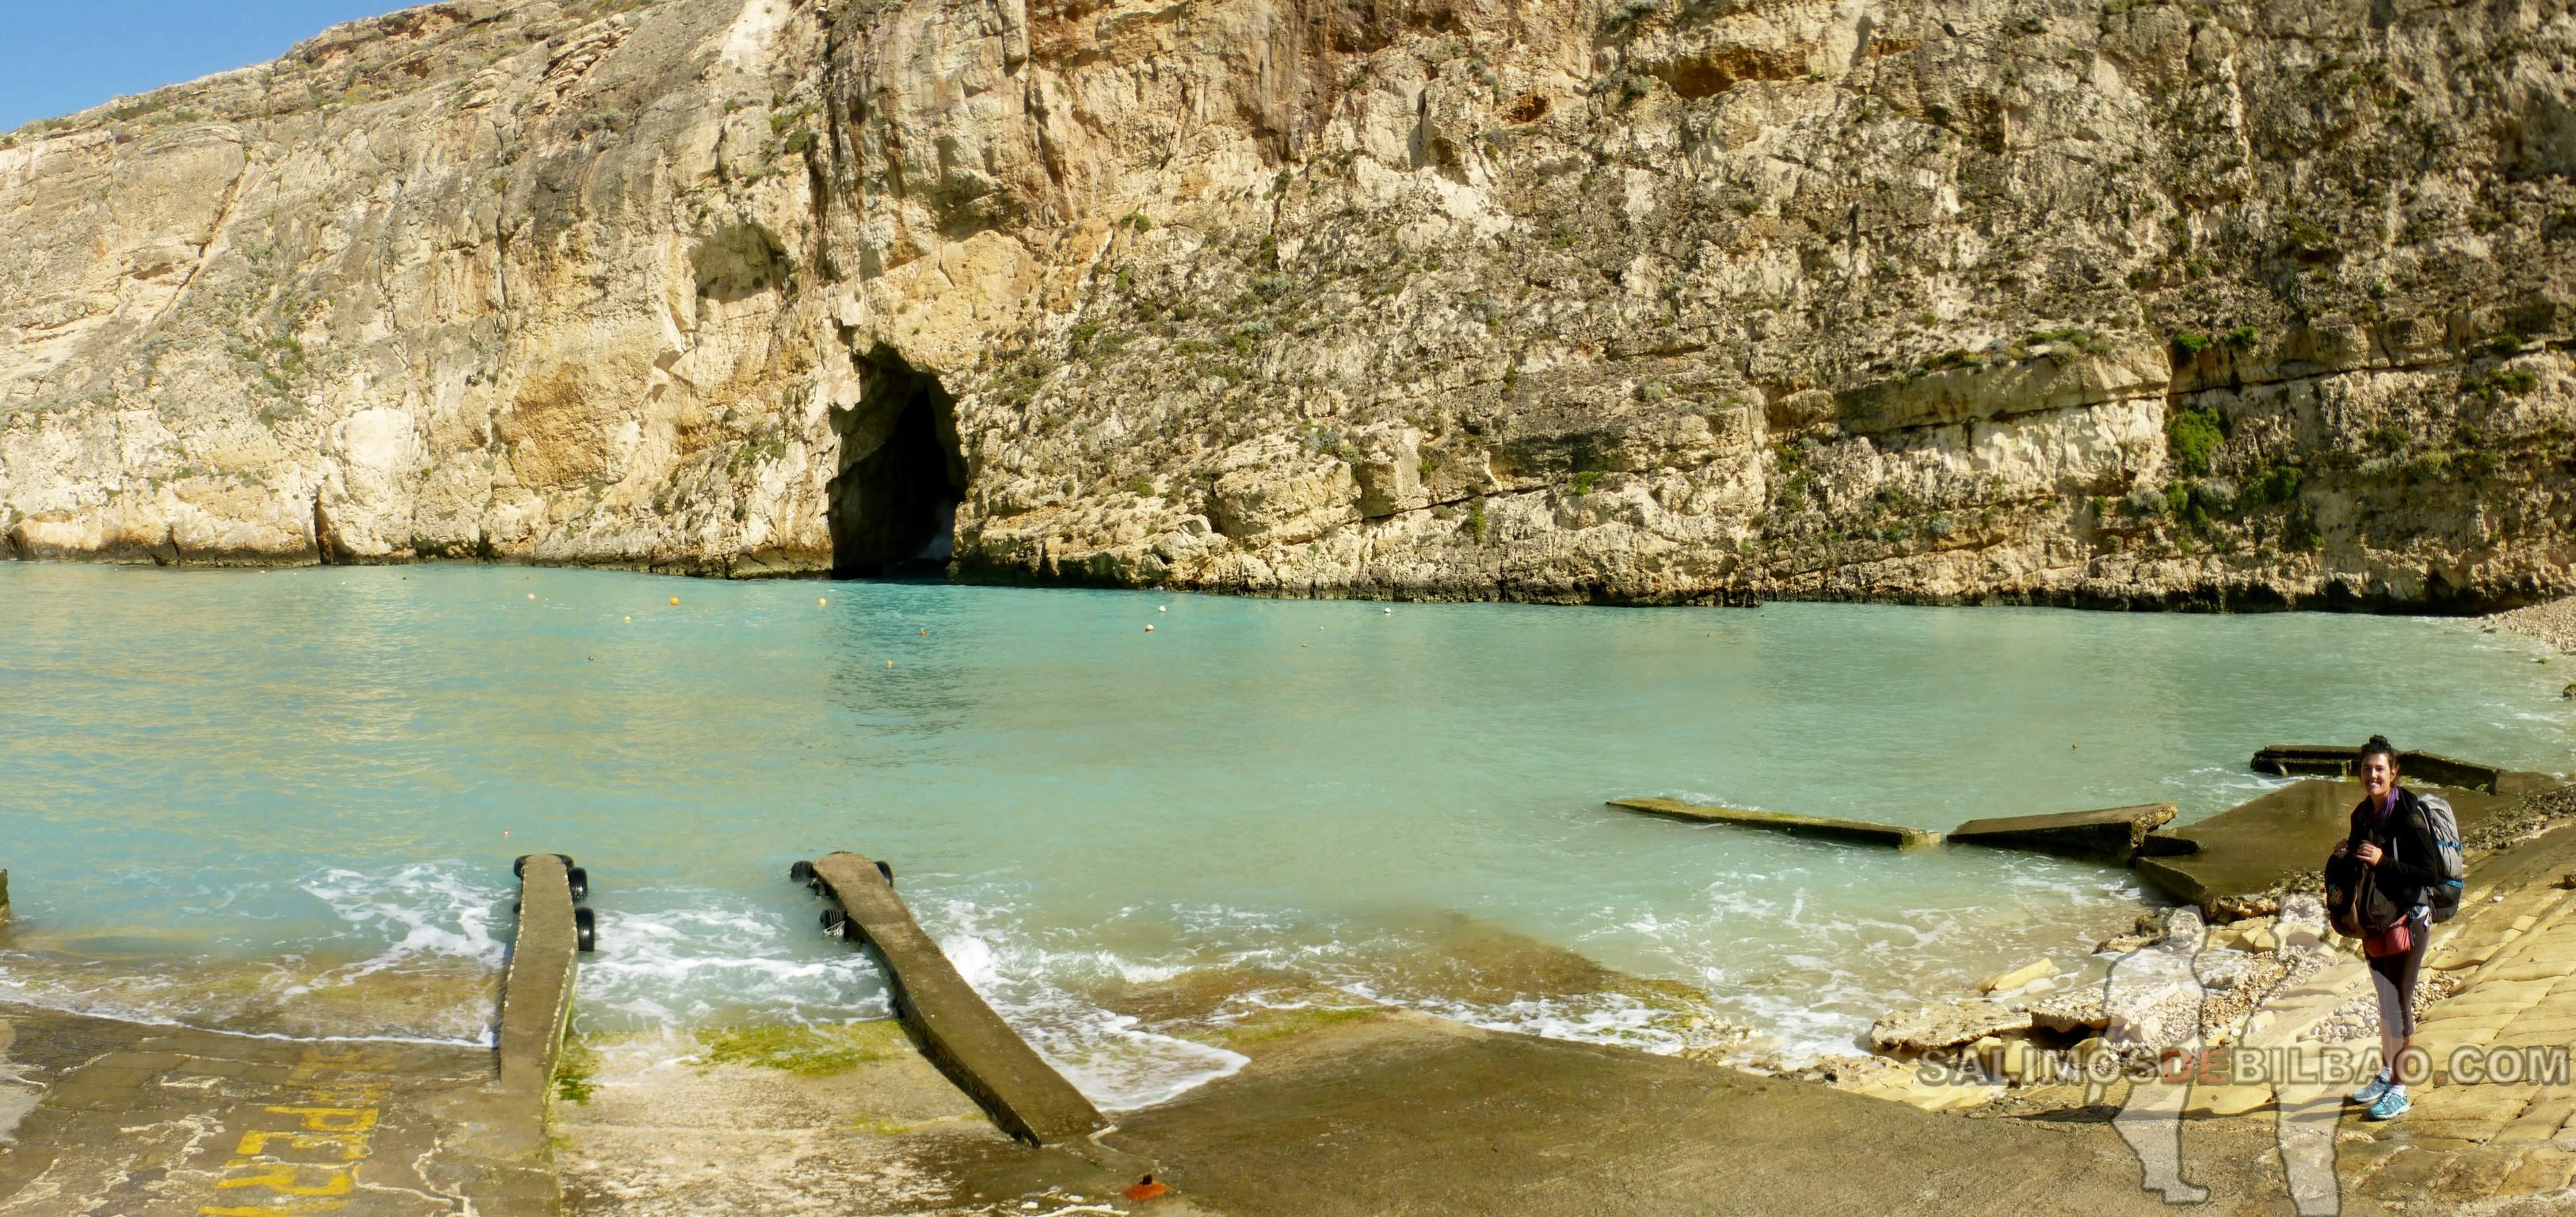 0527. Saioa, Pano, Inland Sea, Gozo